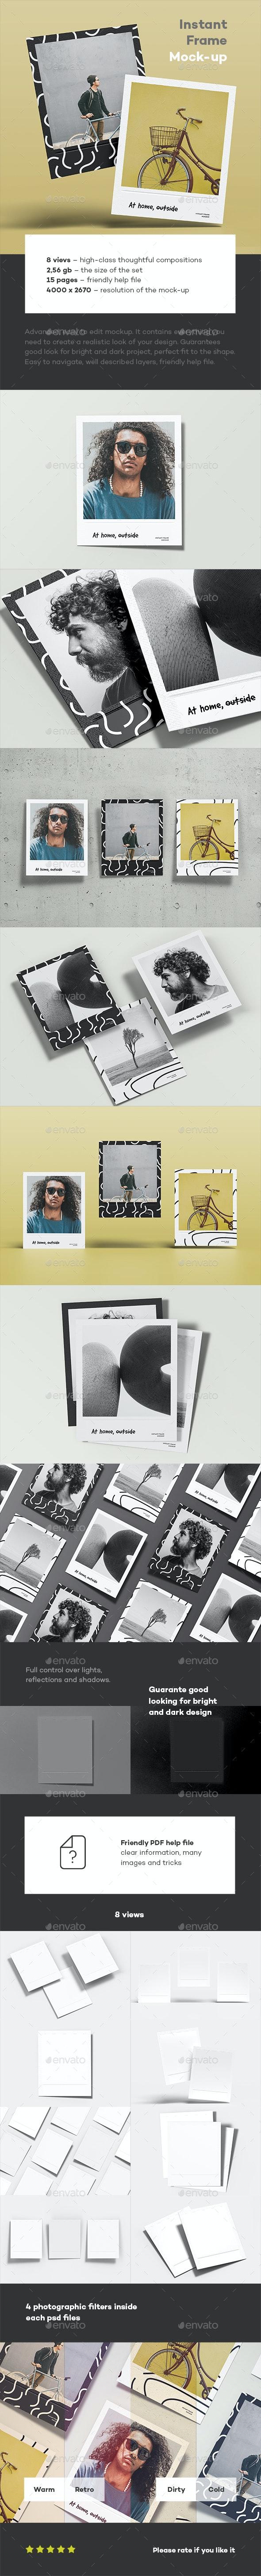 Instant Frame Mokup - Miscellaneous Print